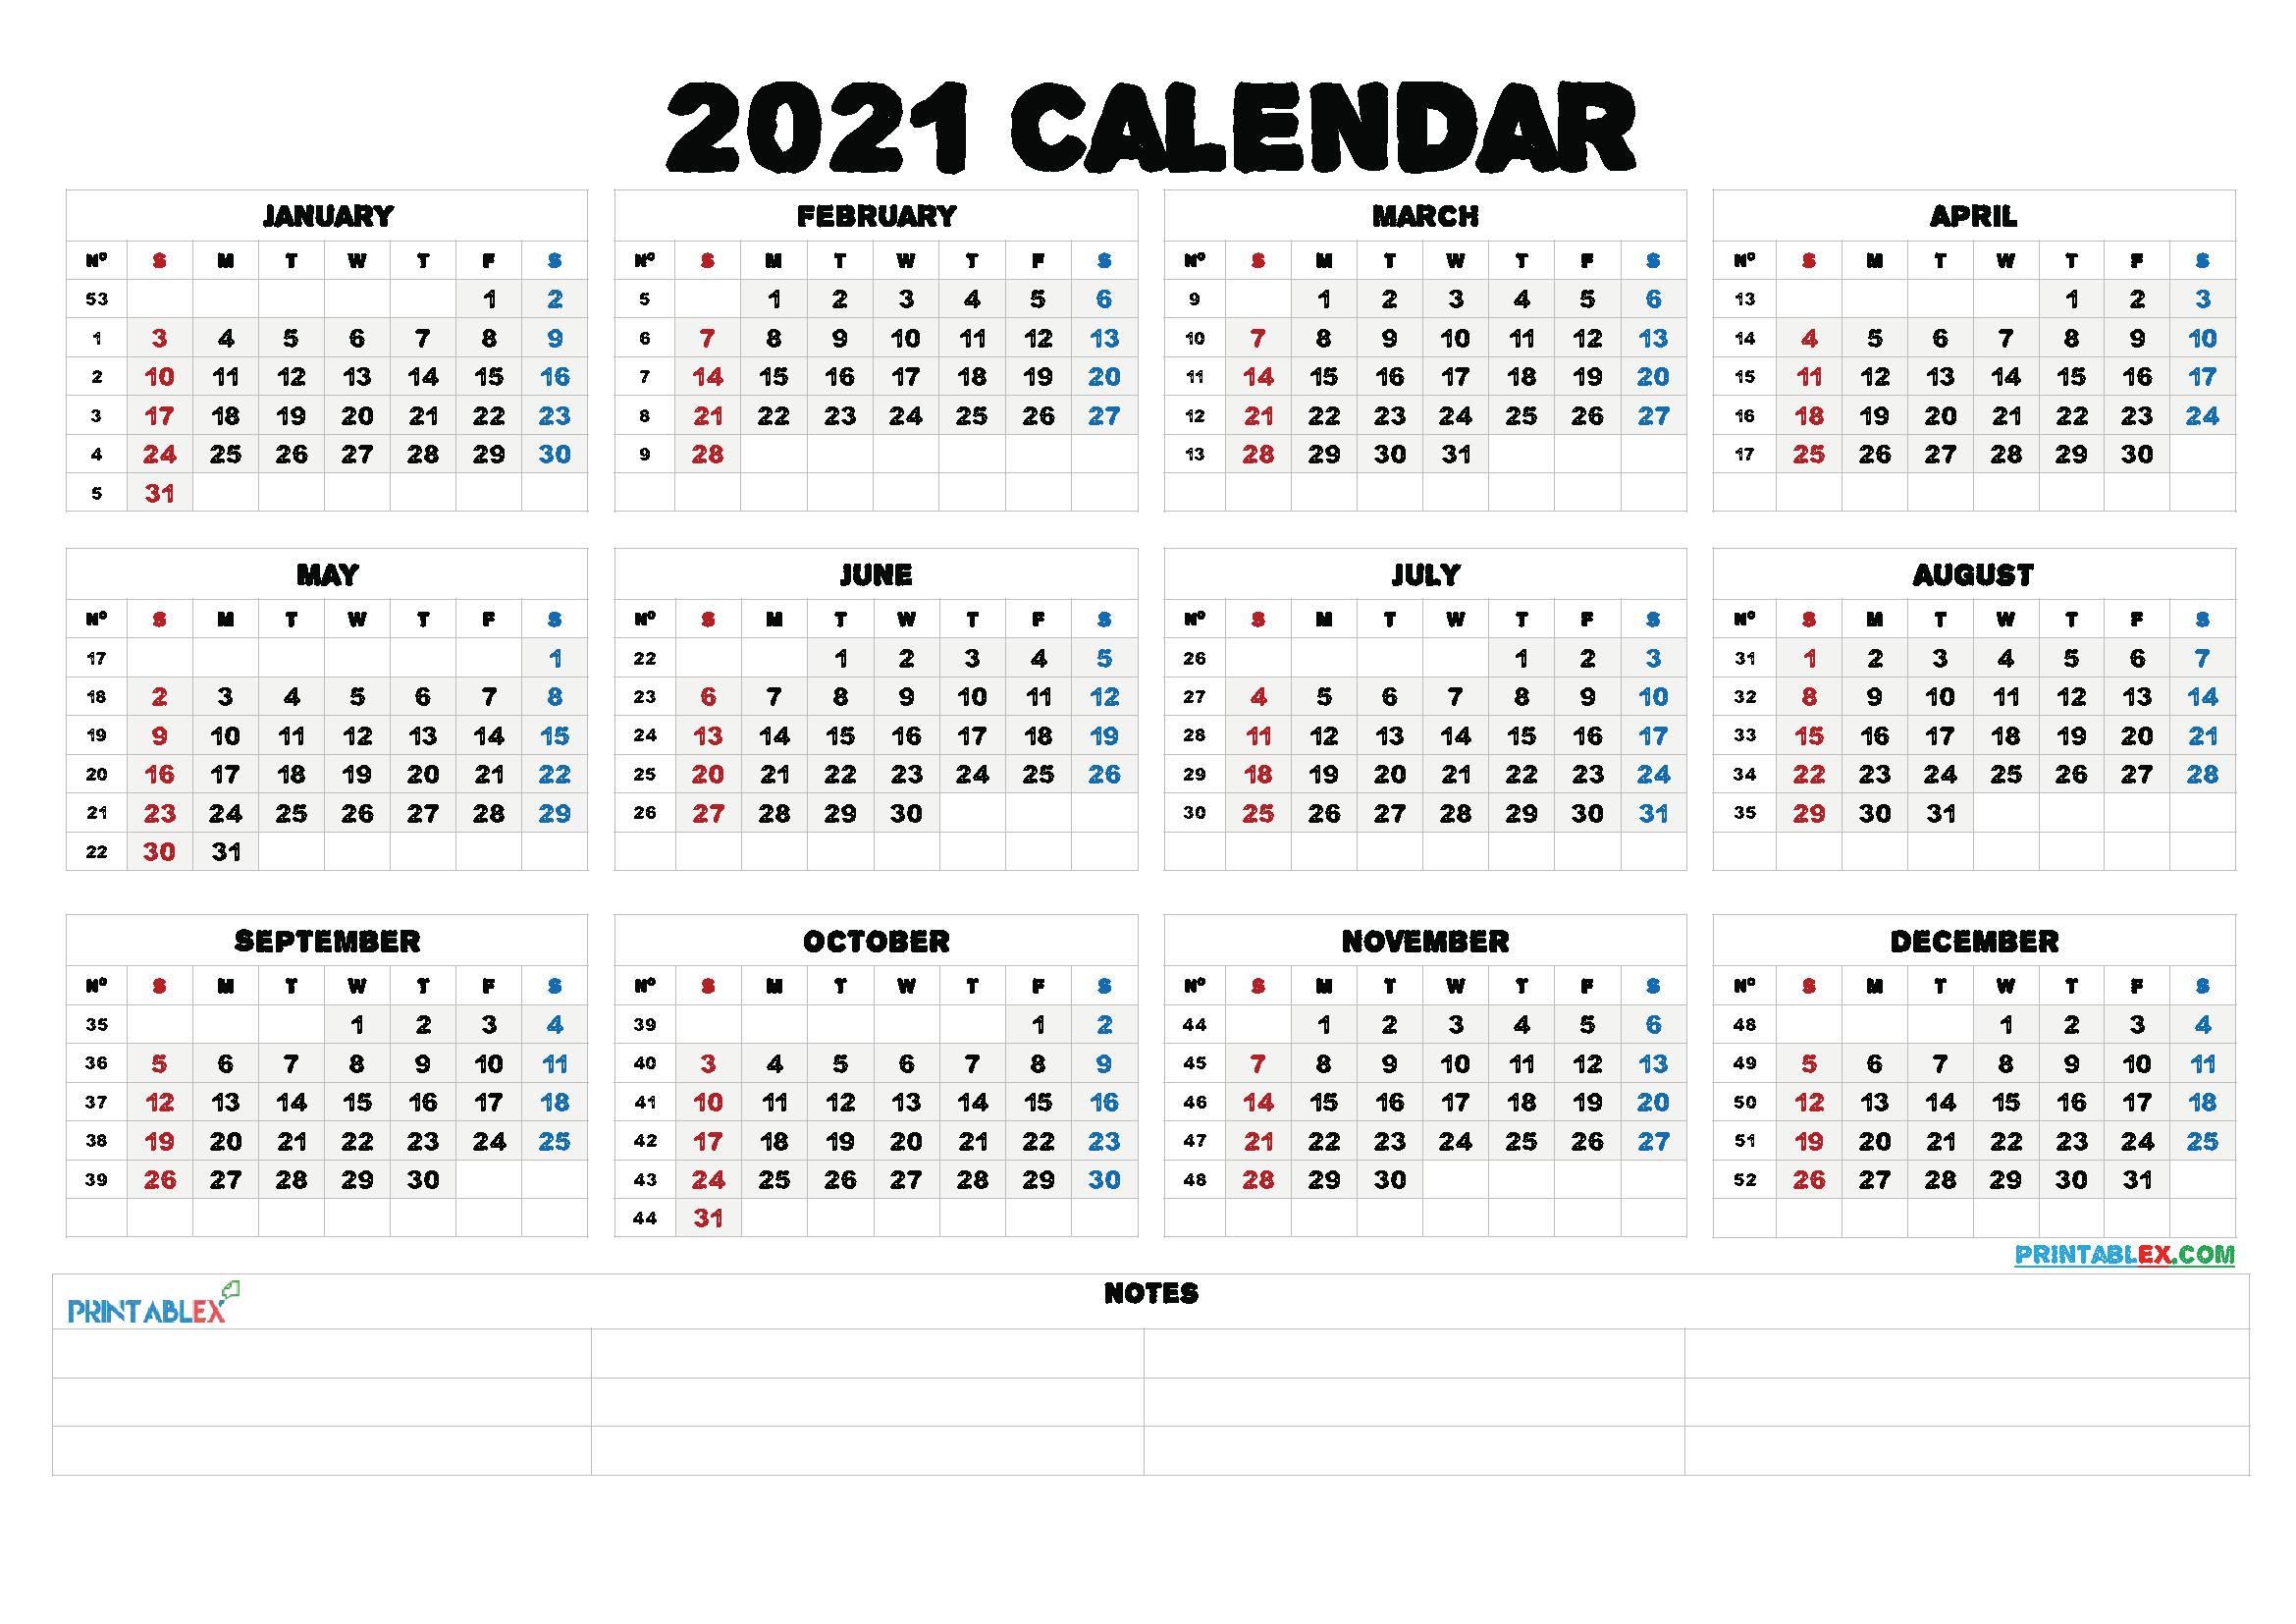 Free Editable Weekly 2021 Calendar - Free 2021 Monthly